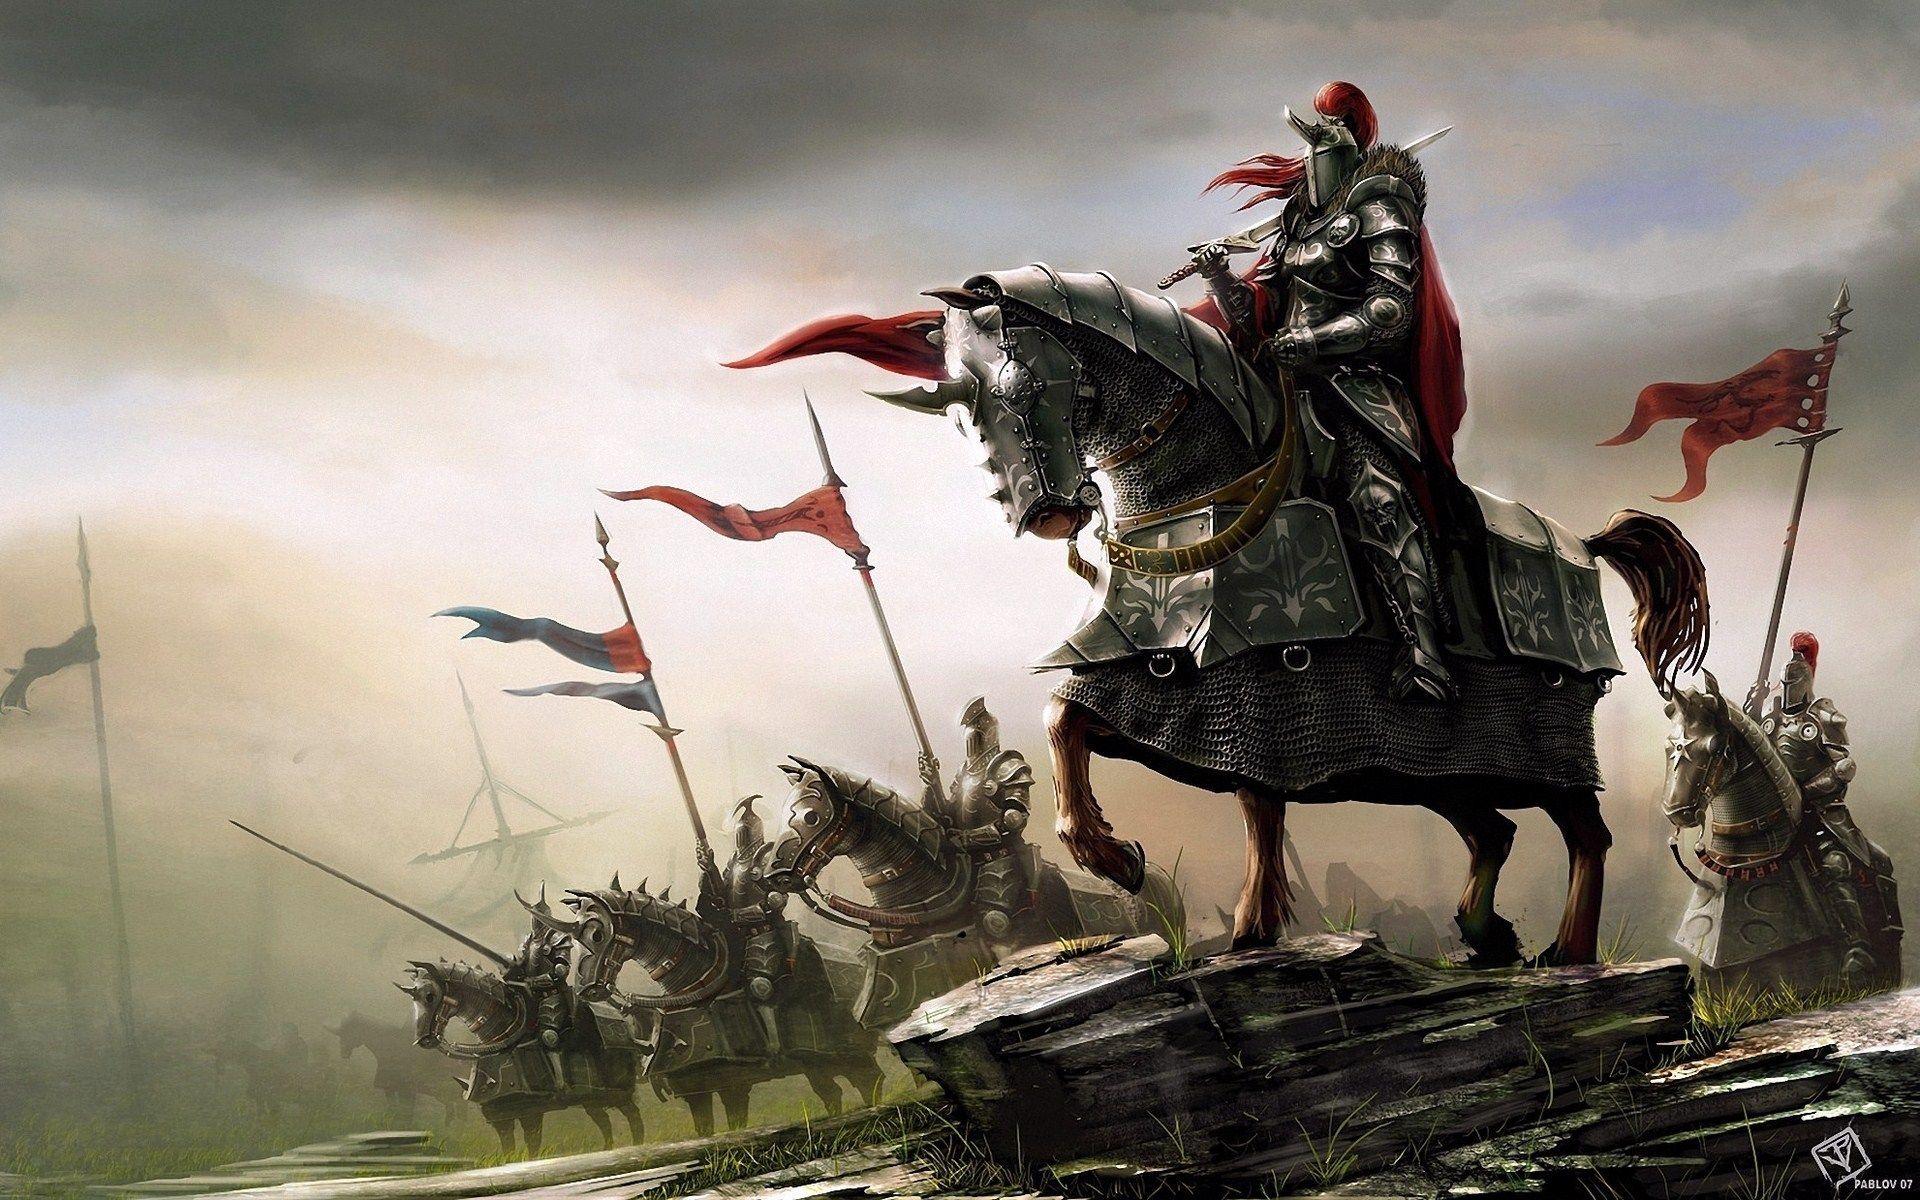 Fantasy Art Knights Warriors Horses Hd Wallpaper Freehdwalls Ritter Fantasie Ritter Im Mittelalter